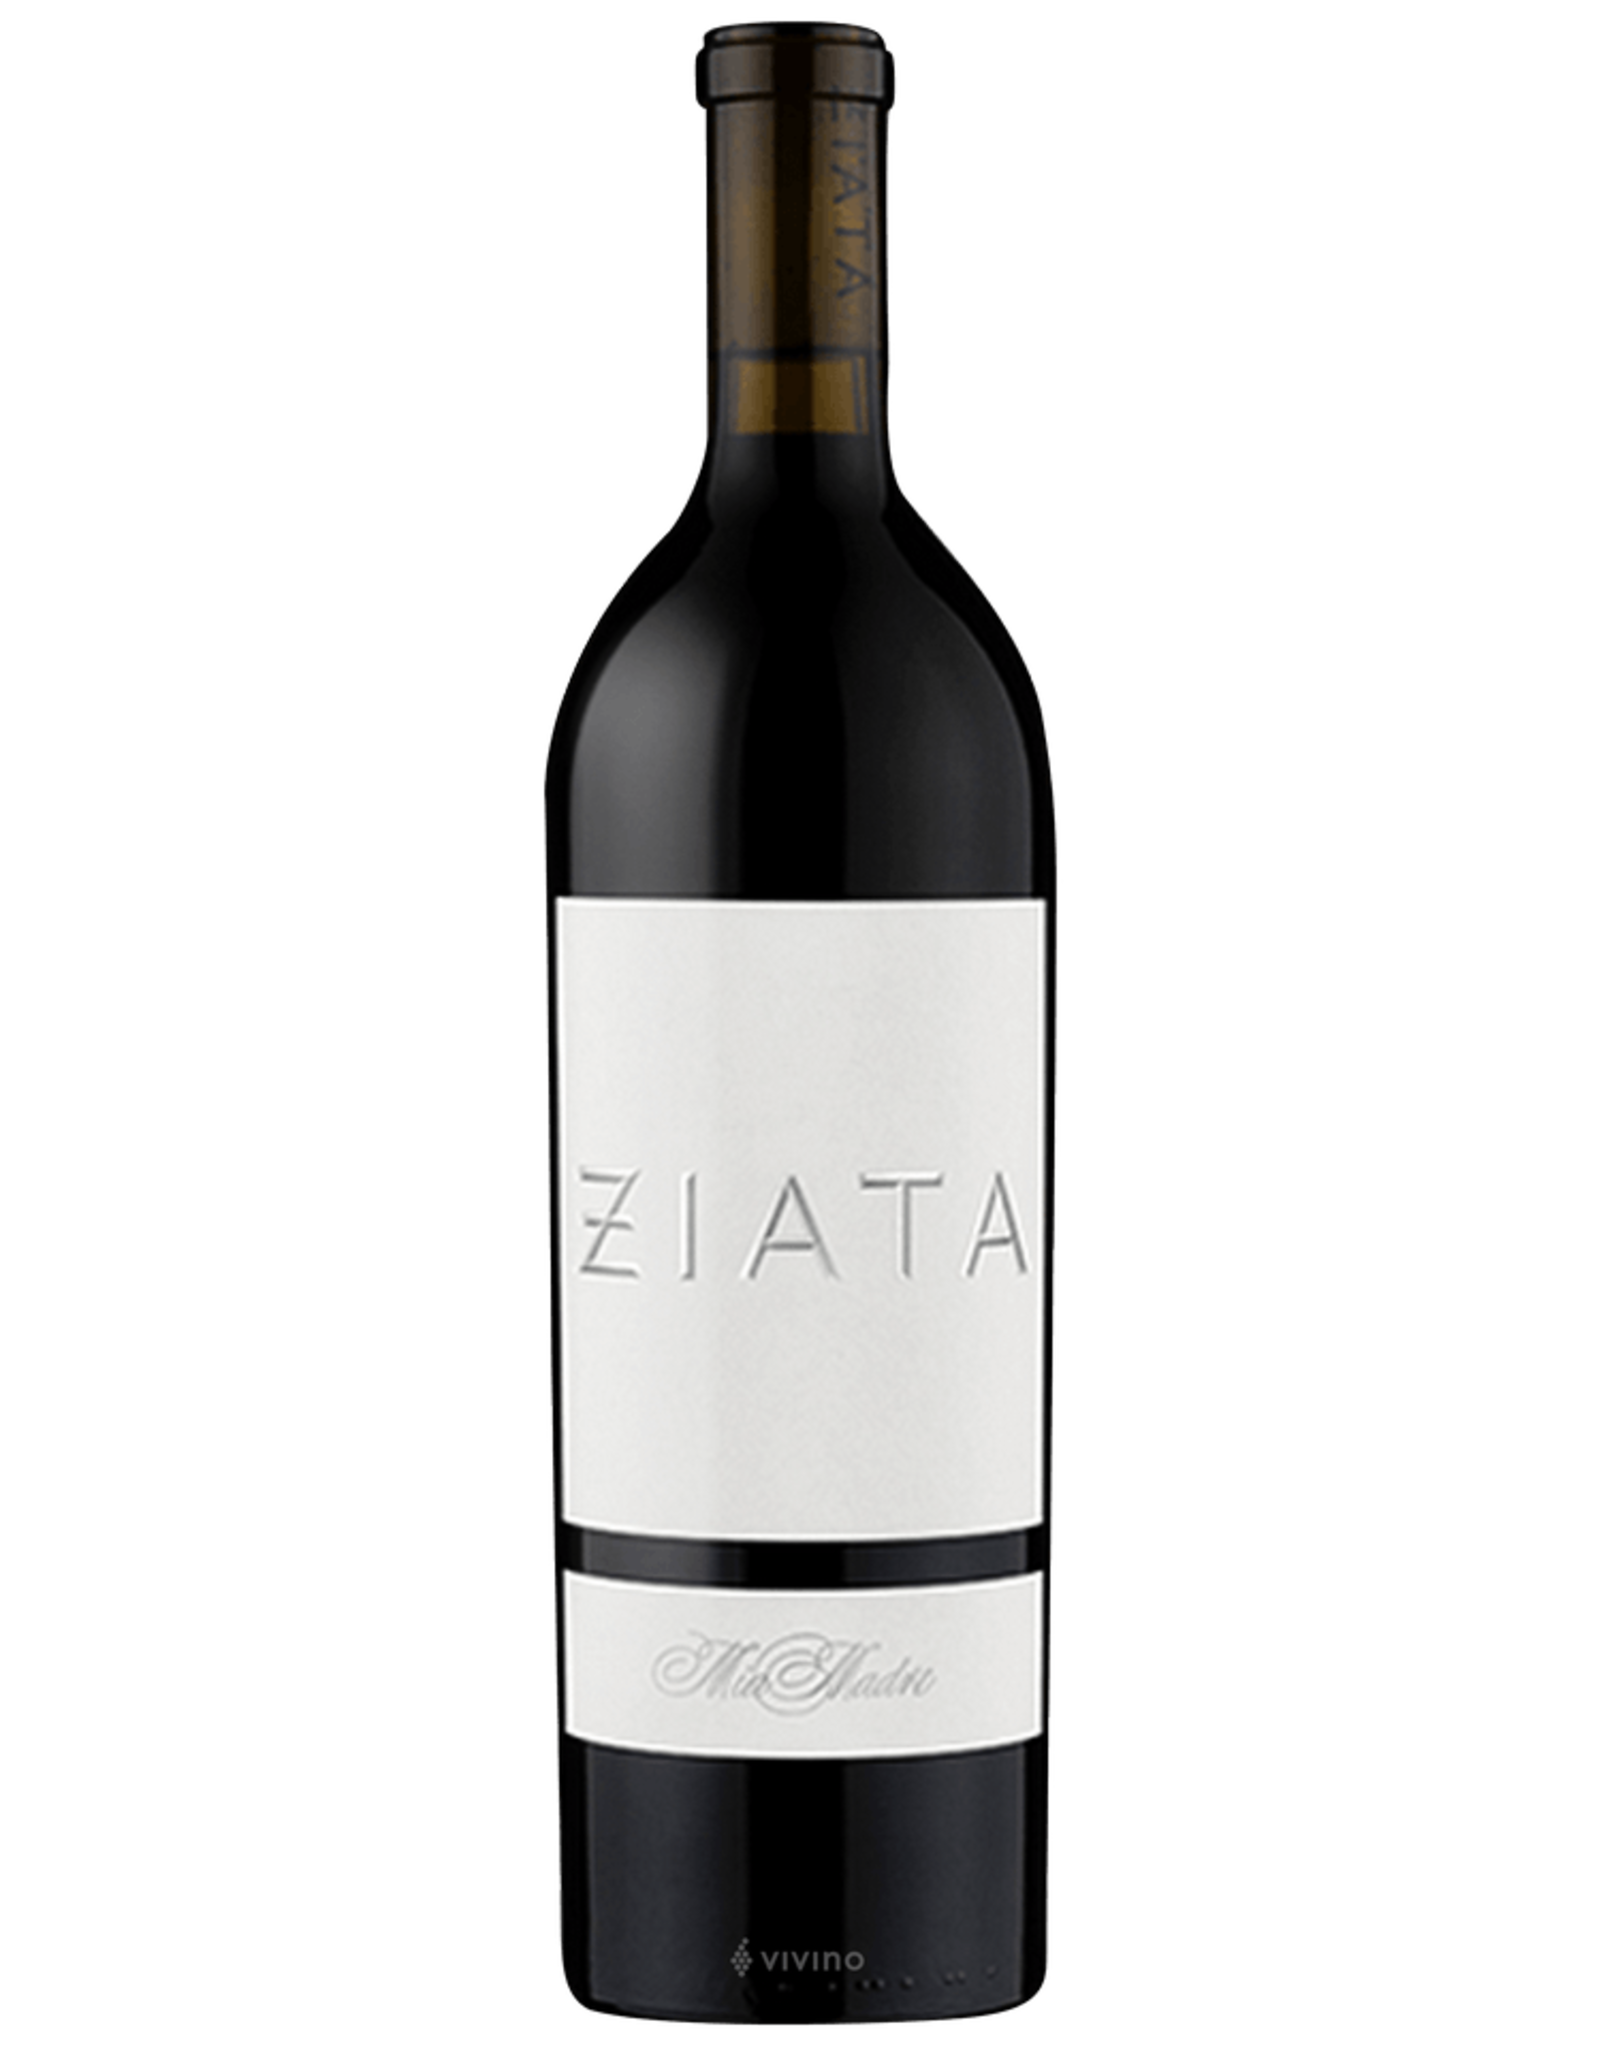 Ziata, Mia Madre Red blend 2014